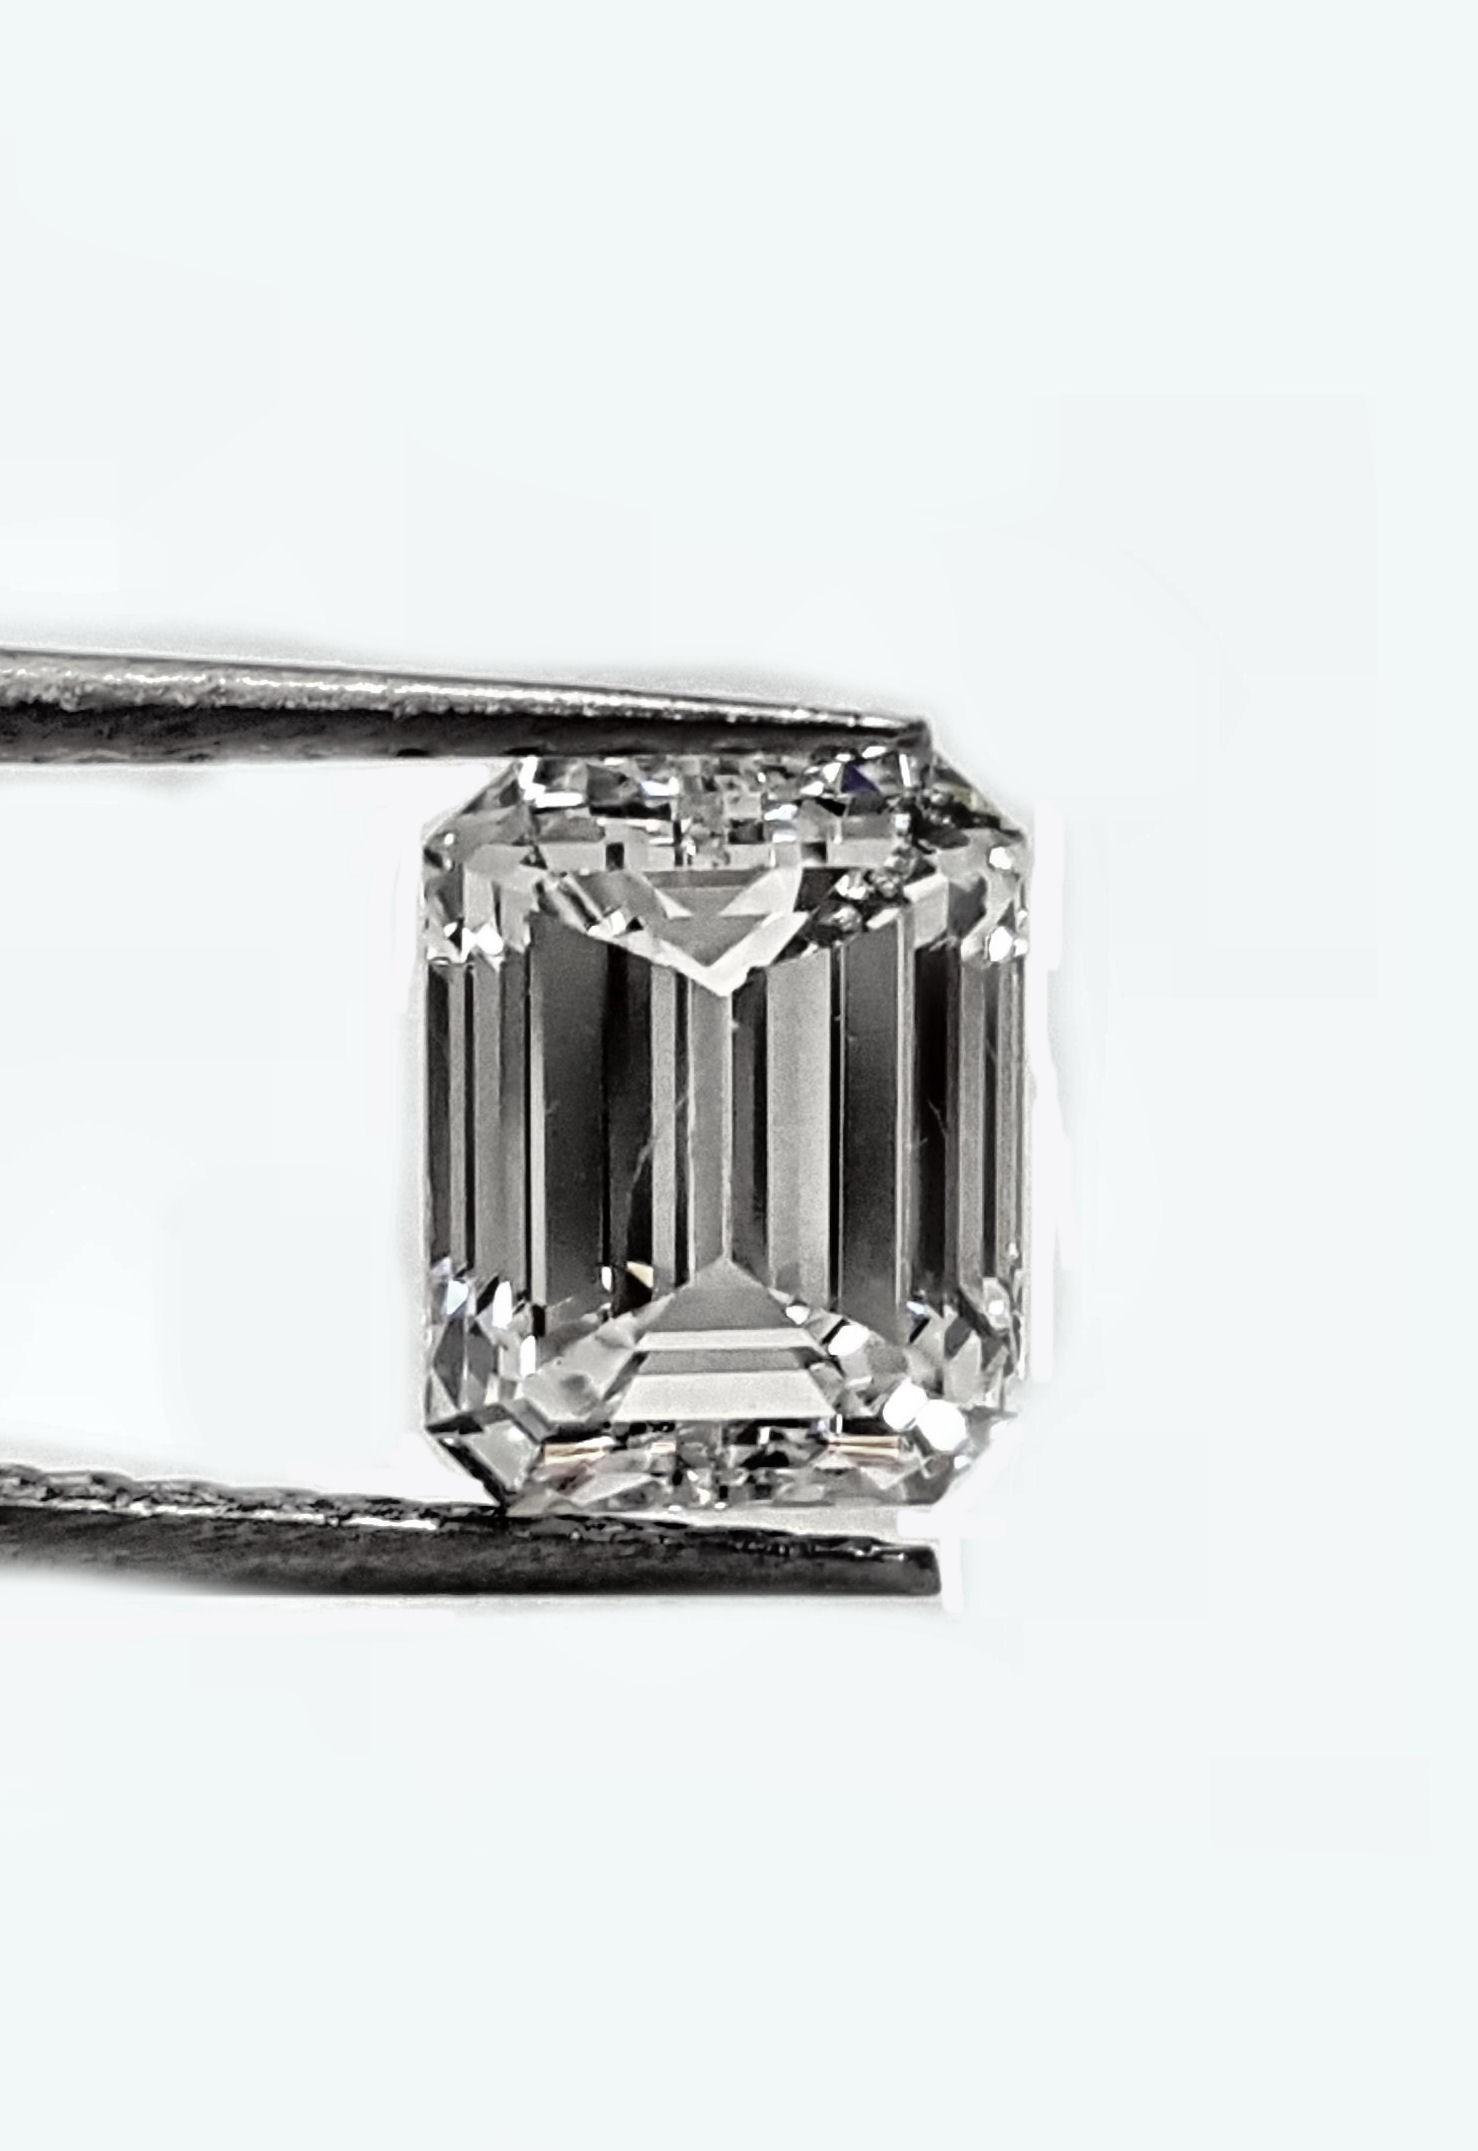 91pt. Emerald cut 91pts. H SI1 GIA certified